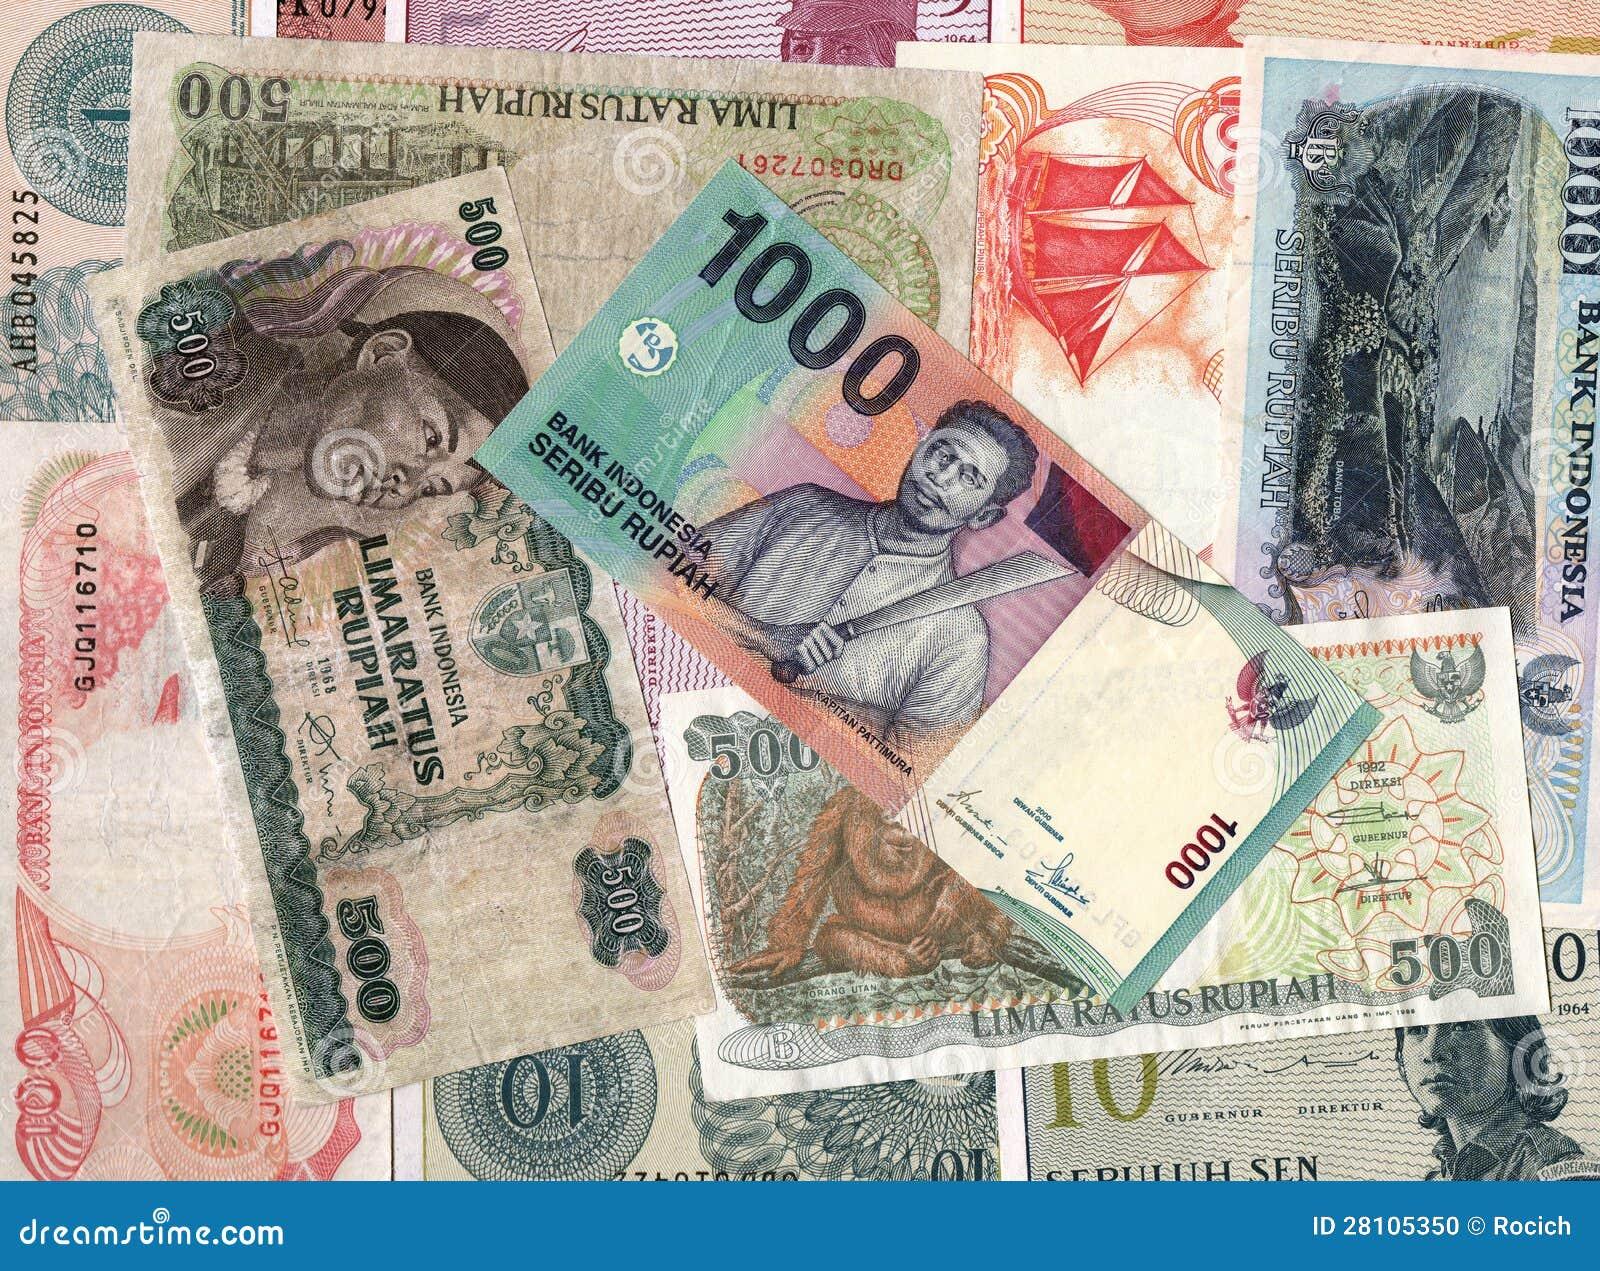 worksheet Money Bills background of indonesia money bills stock photo image 28105350 bills